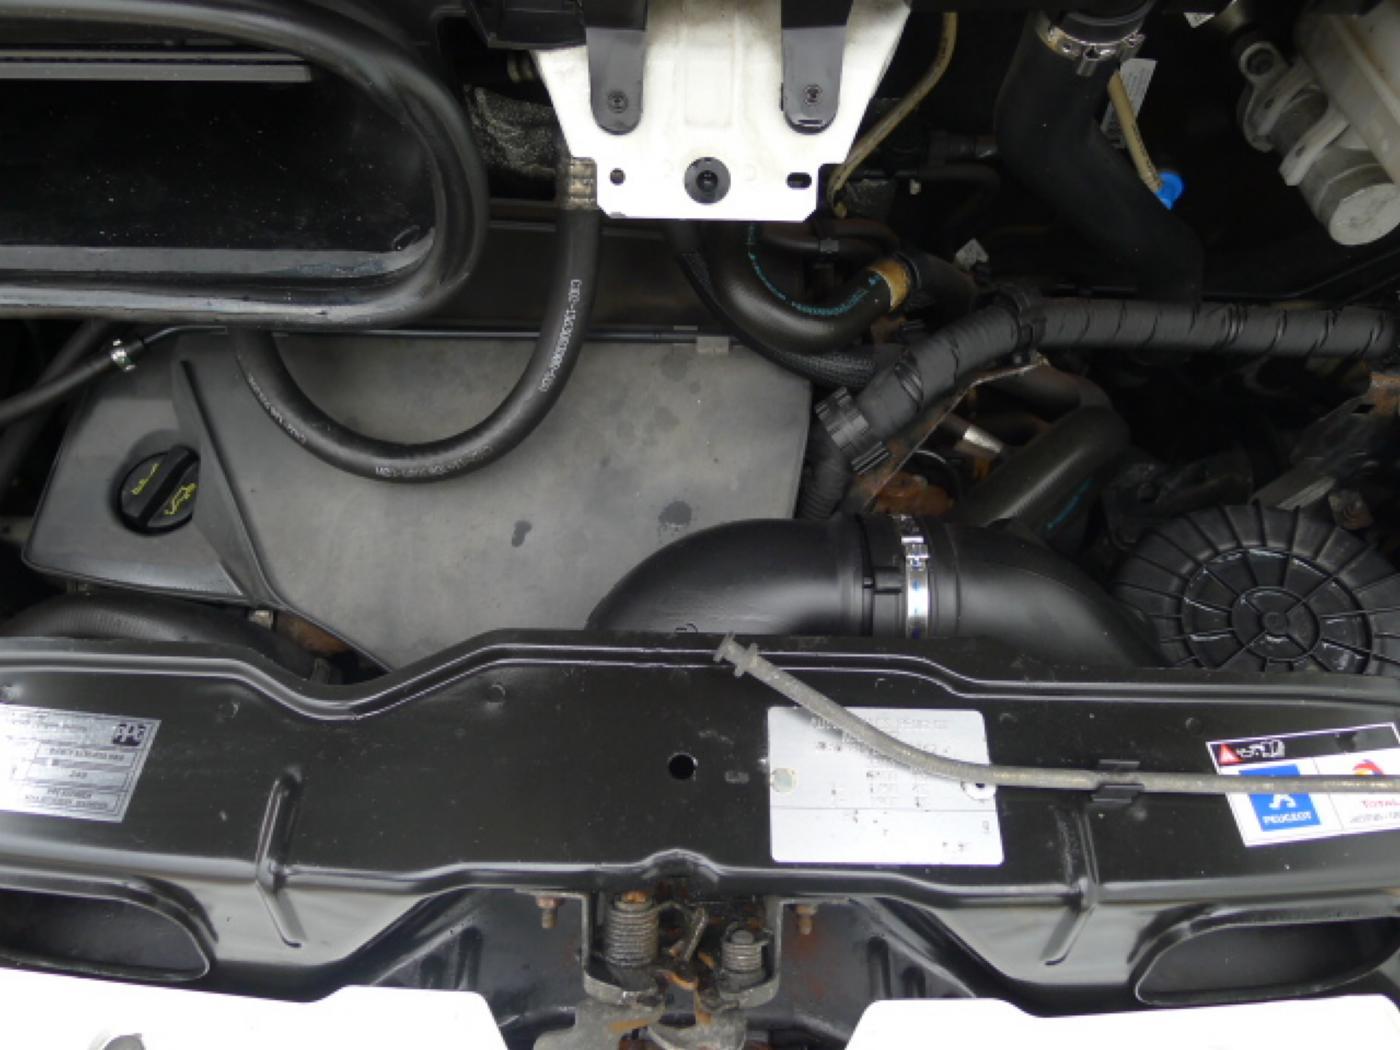 Peugeot Boxer 2.2 HDI L2H2 Klima Akce!!! Novinka - 21